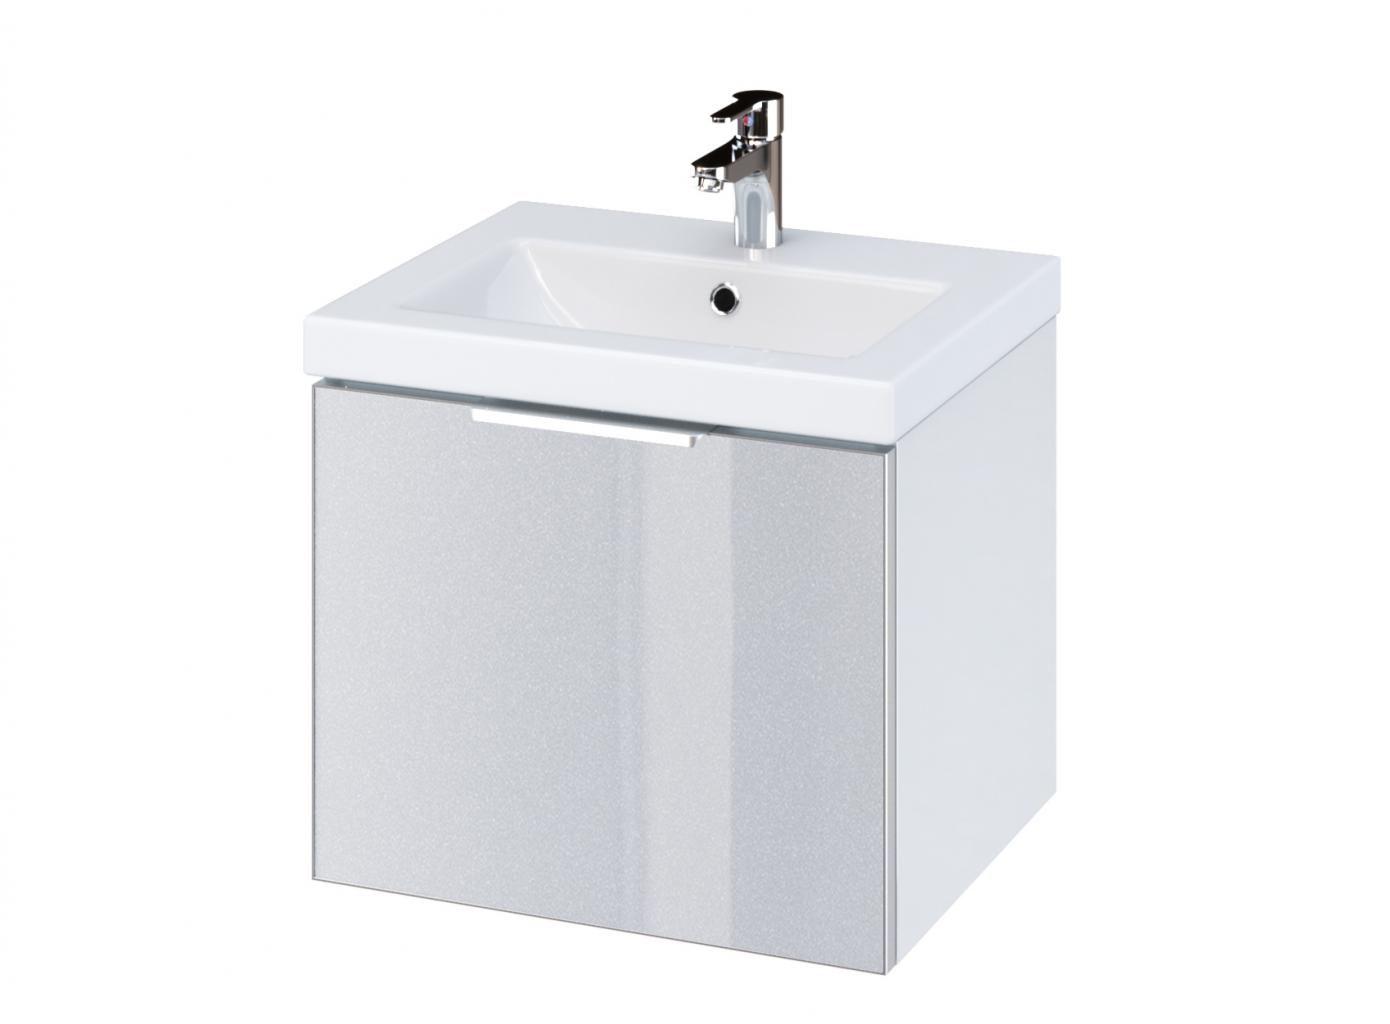 CERSANIT - Skrienka STILLO pod umývadlo COMO/ COLOUR 50, biela/ šedé dvere (S575-002)